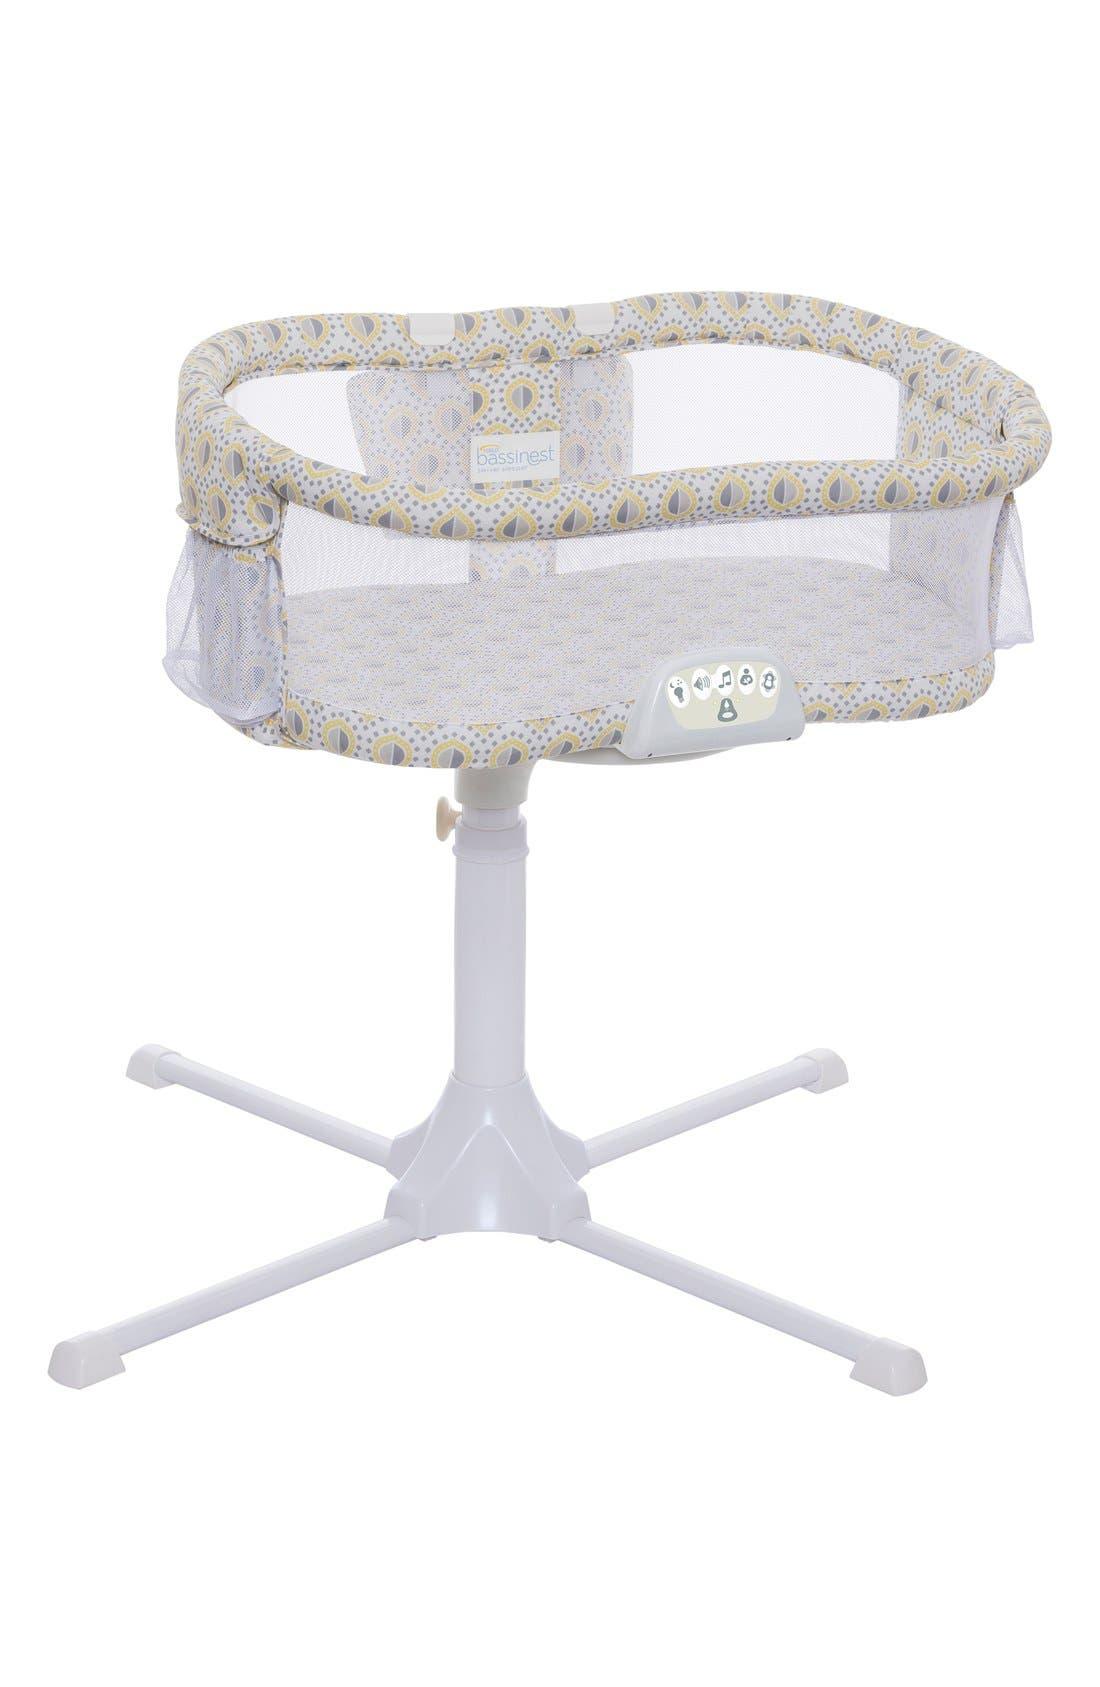 Halo Innovations 'Bassinest - Luxe' Bedside Swivel Sleeper (Baby)